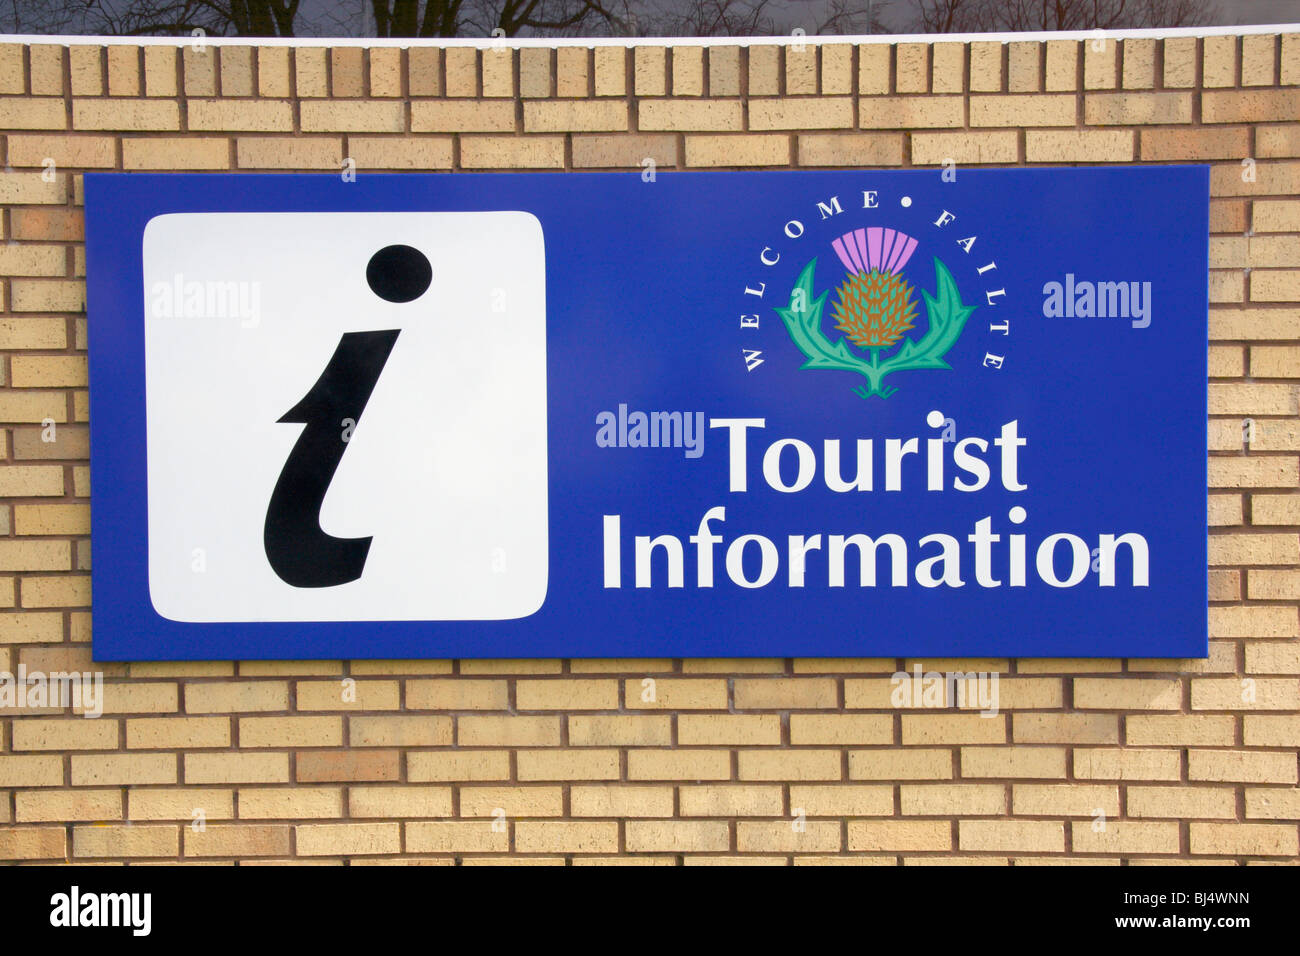 Tourist Information sign, Scotland - Stock Image